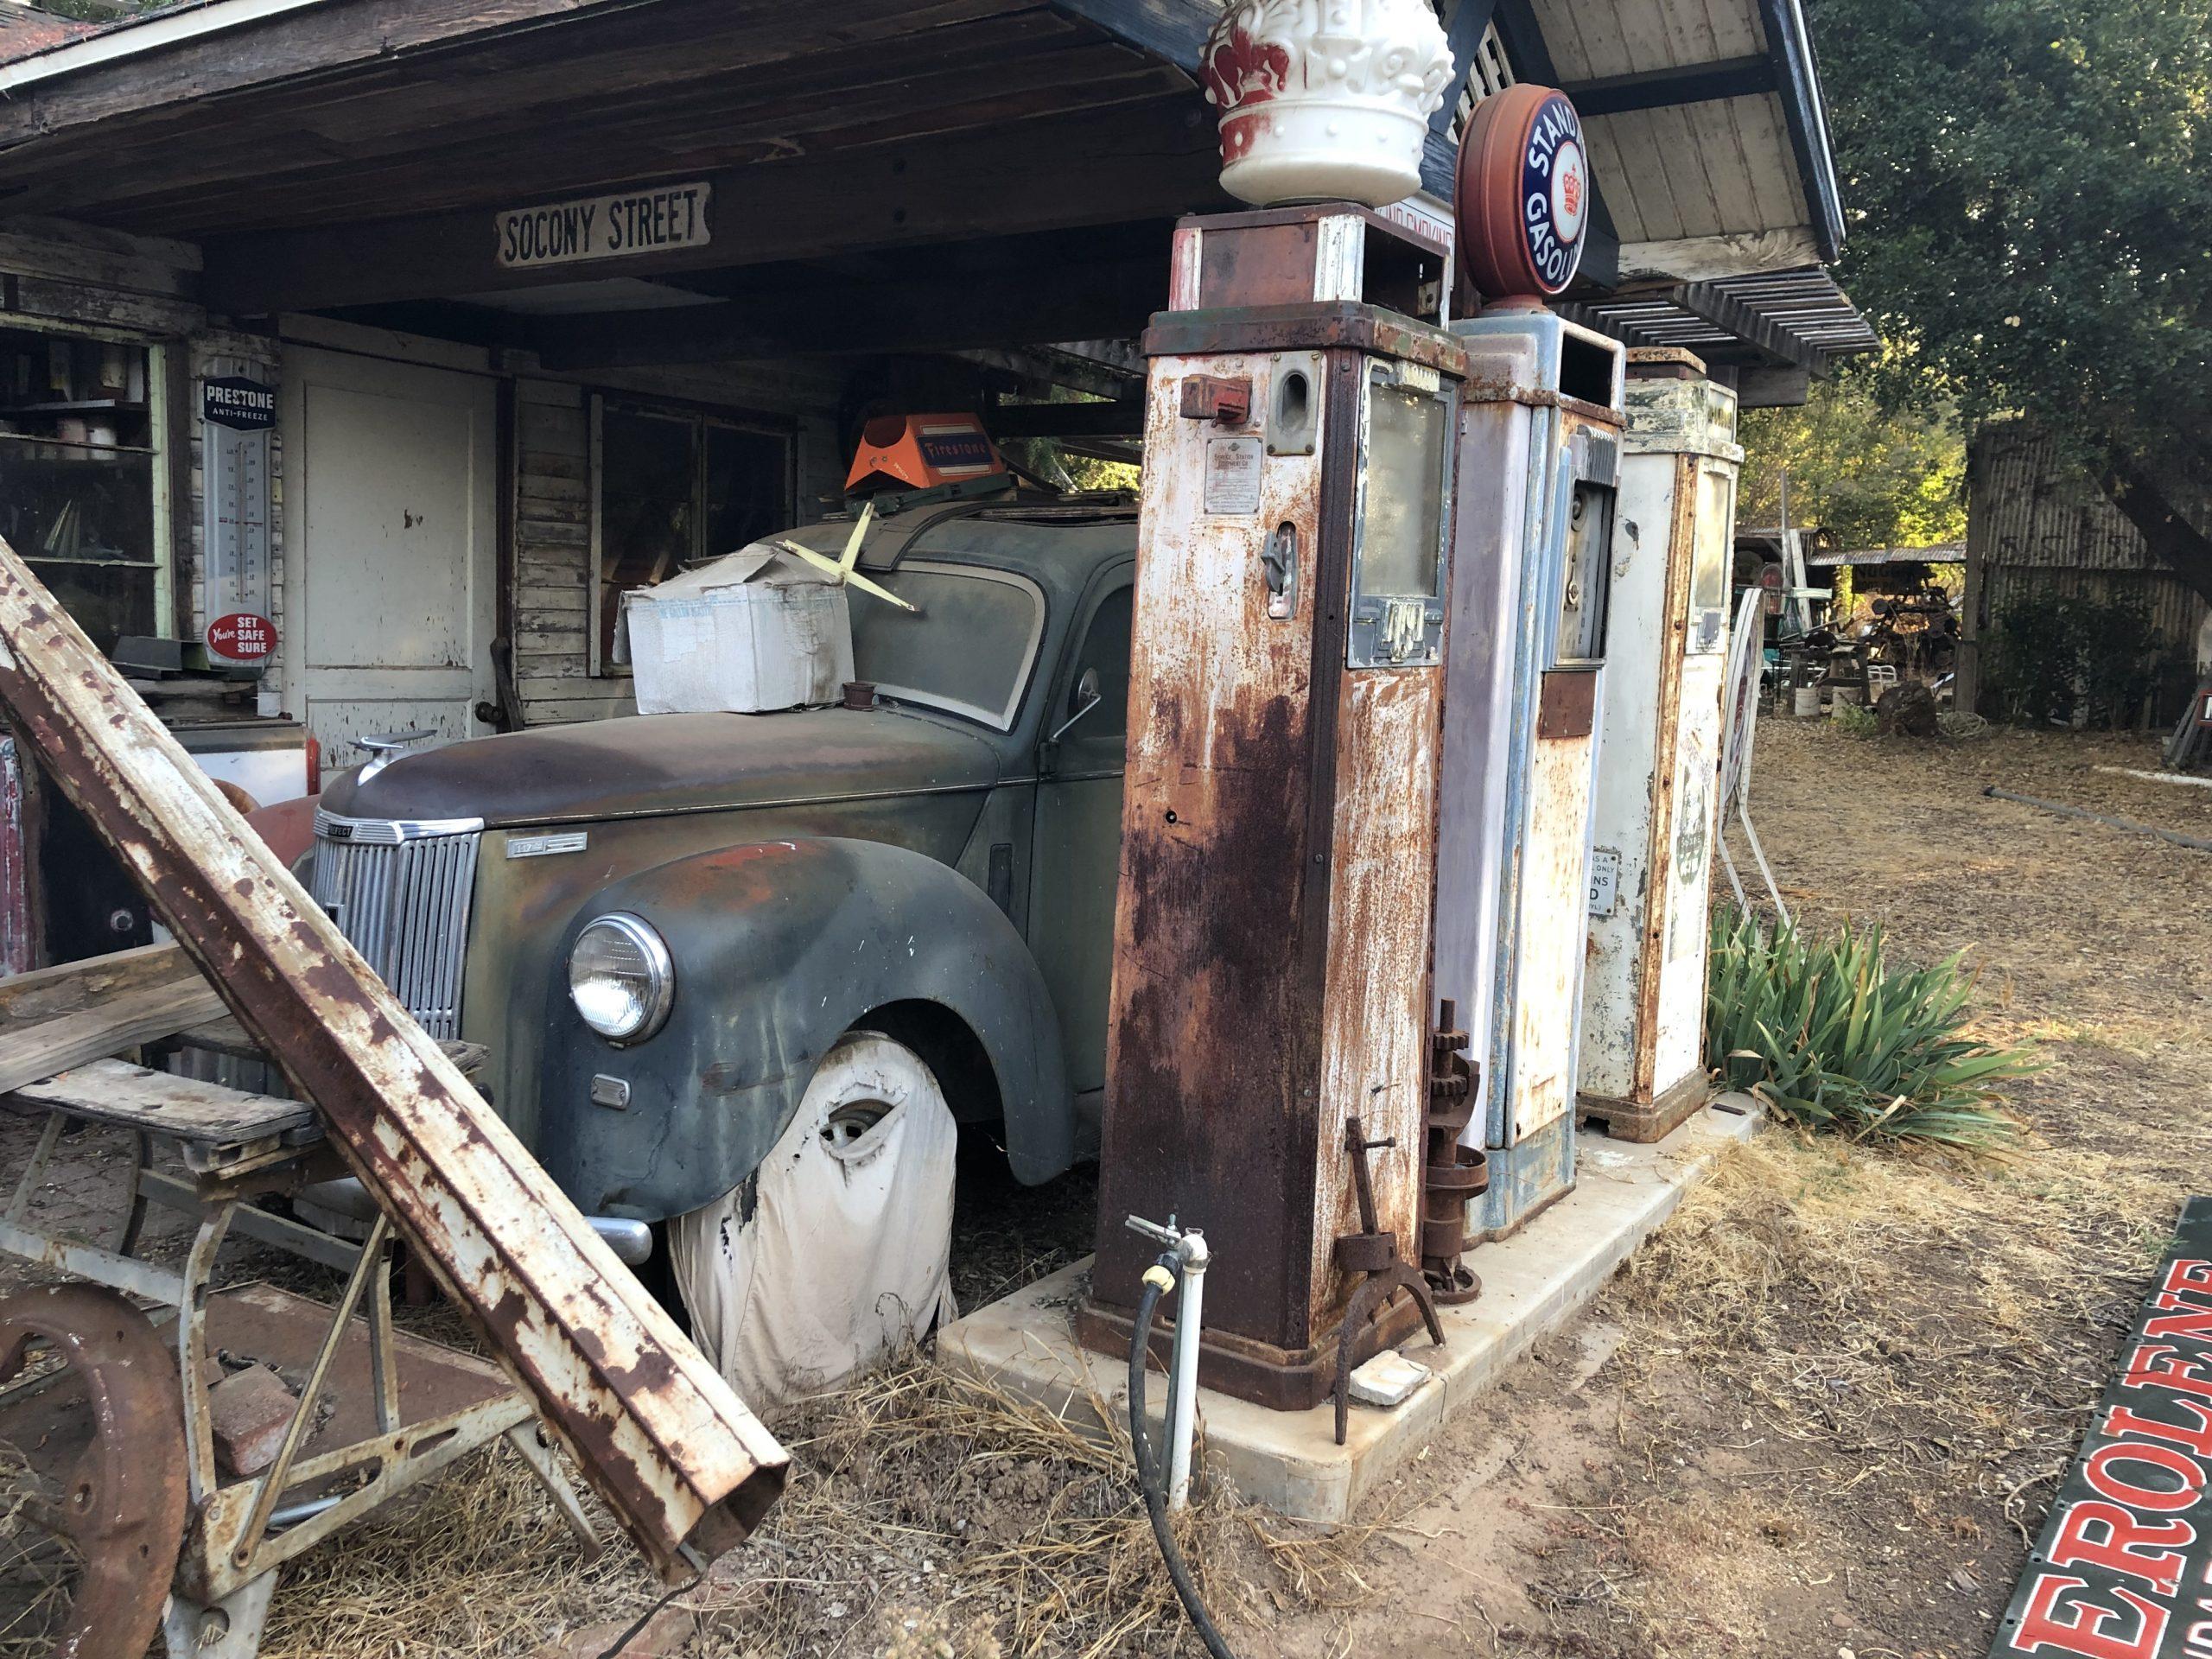 vintage car behind antique gas pumps